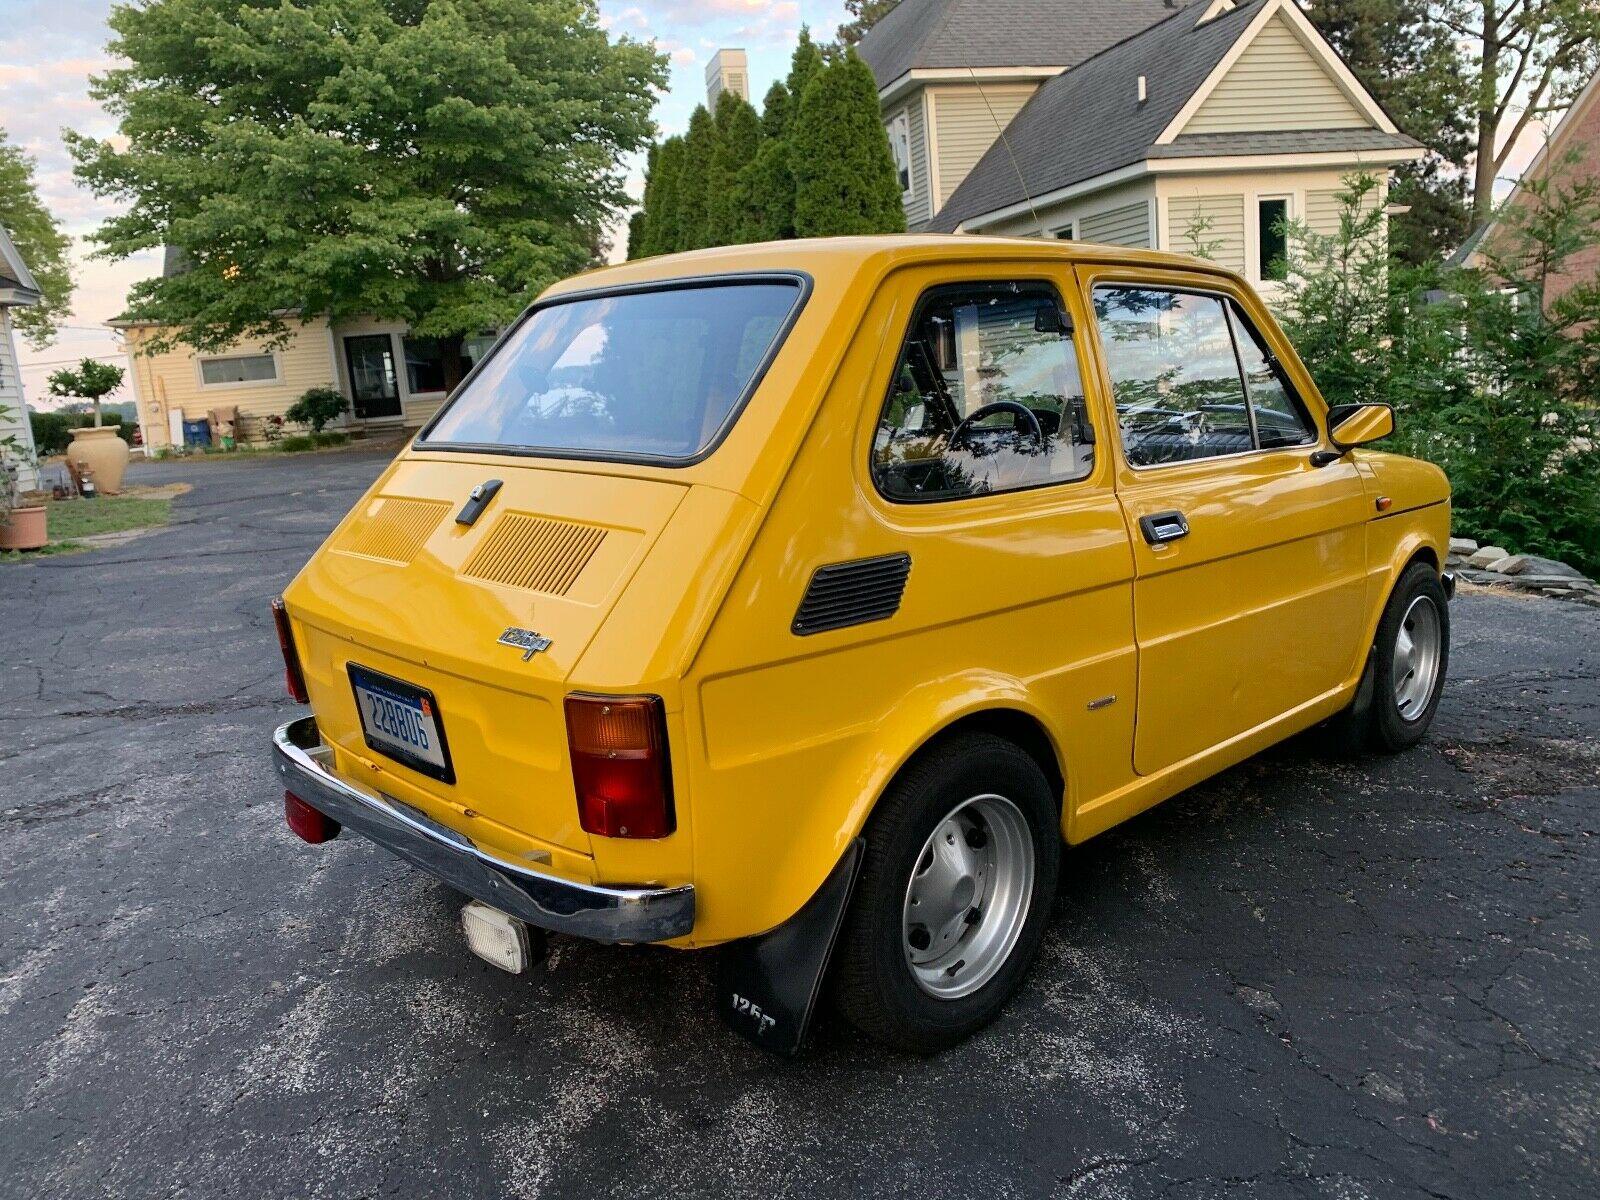 1976 Fiat 126 P rear